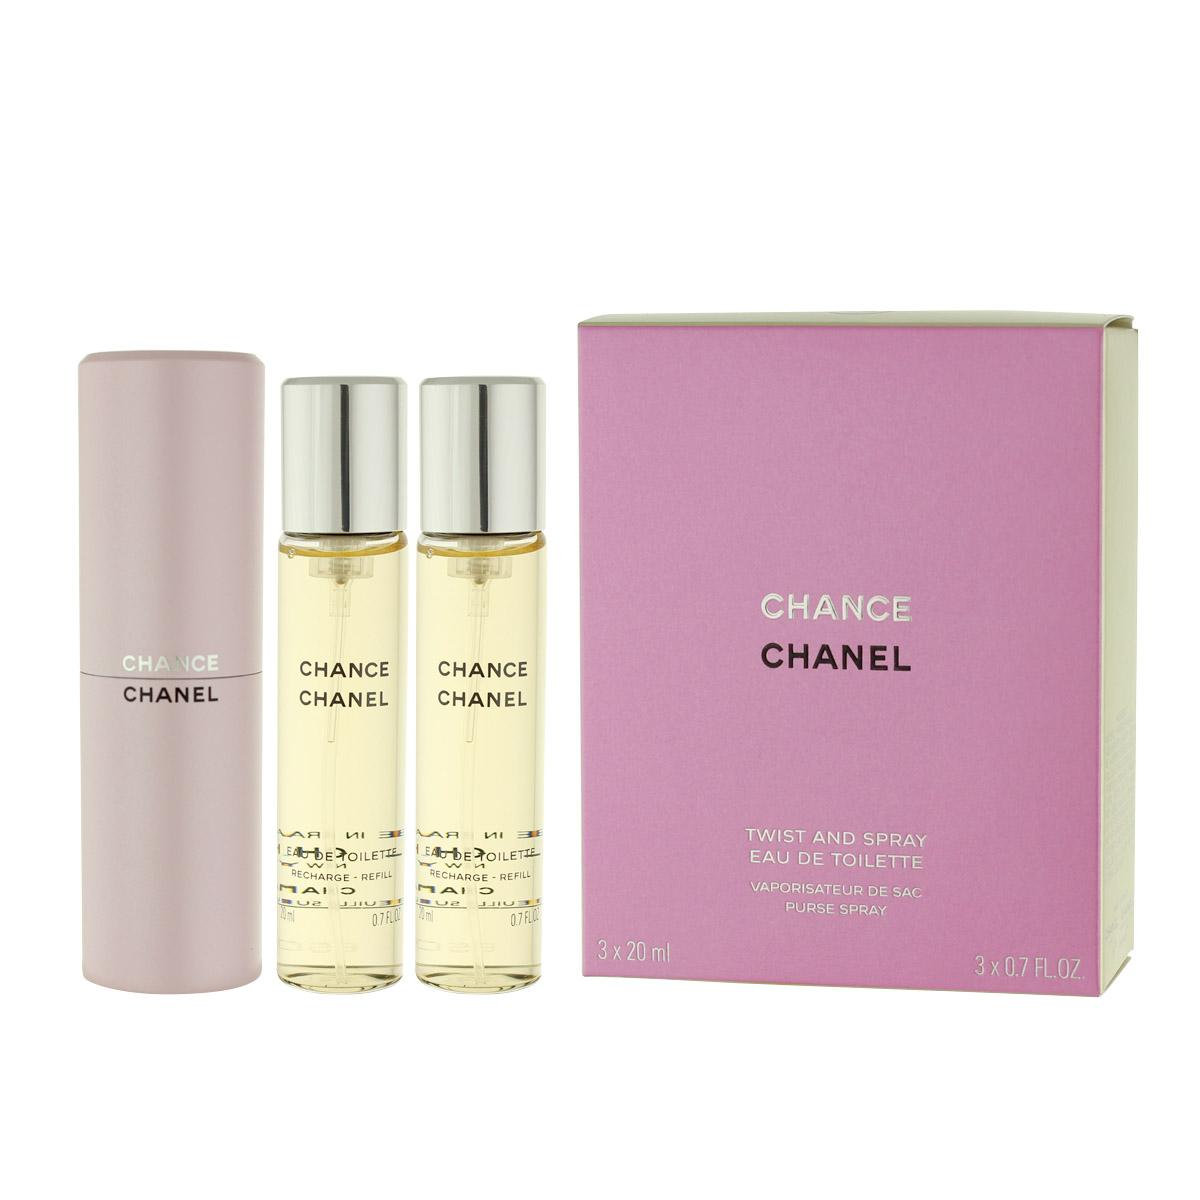 Chanel Chance EDT plnitelný 20 ml + EDT náplň 2 x 20 ml W